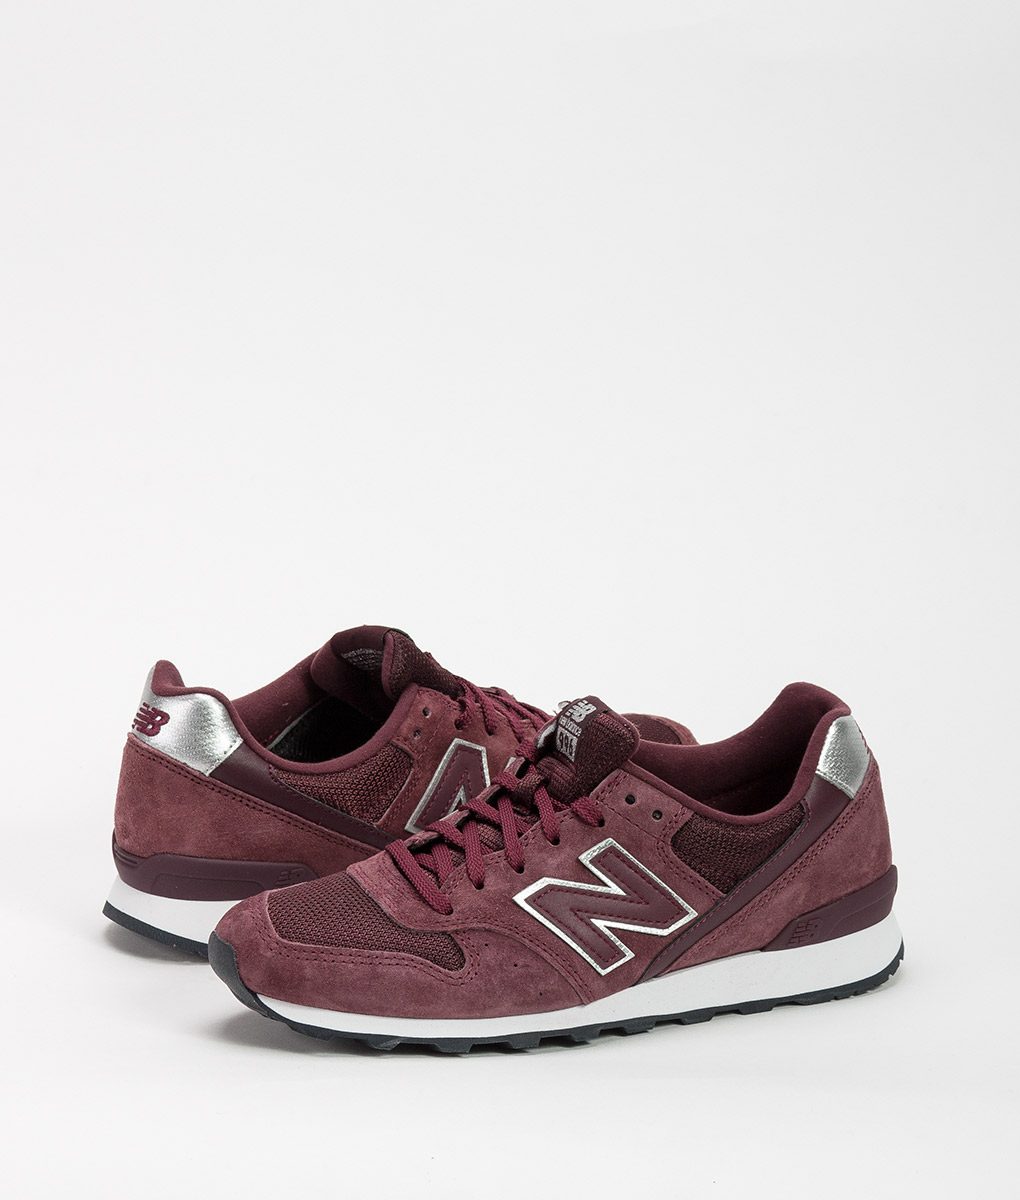 new products 1f8ca b93fb NEW BALANCE Women Running Shoes WR996 Burgundy HB 99.99 1 – T6/8